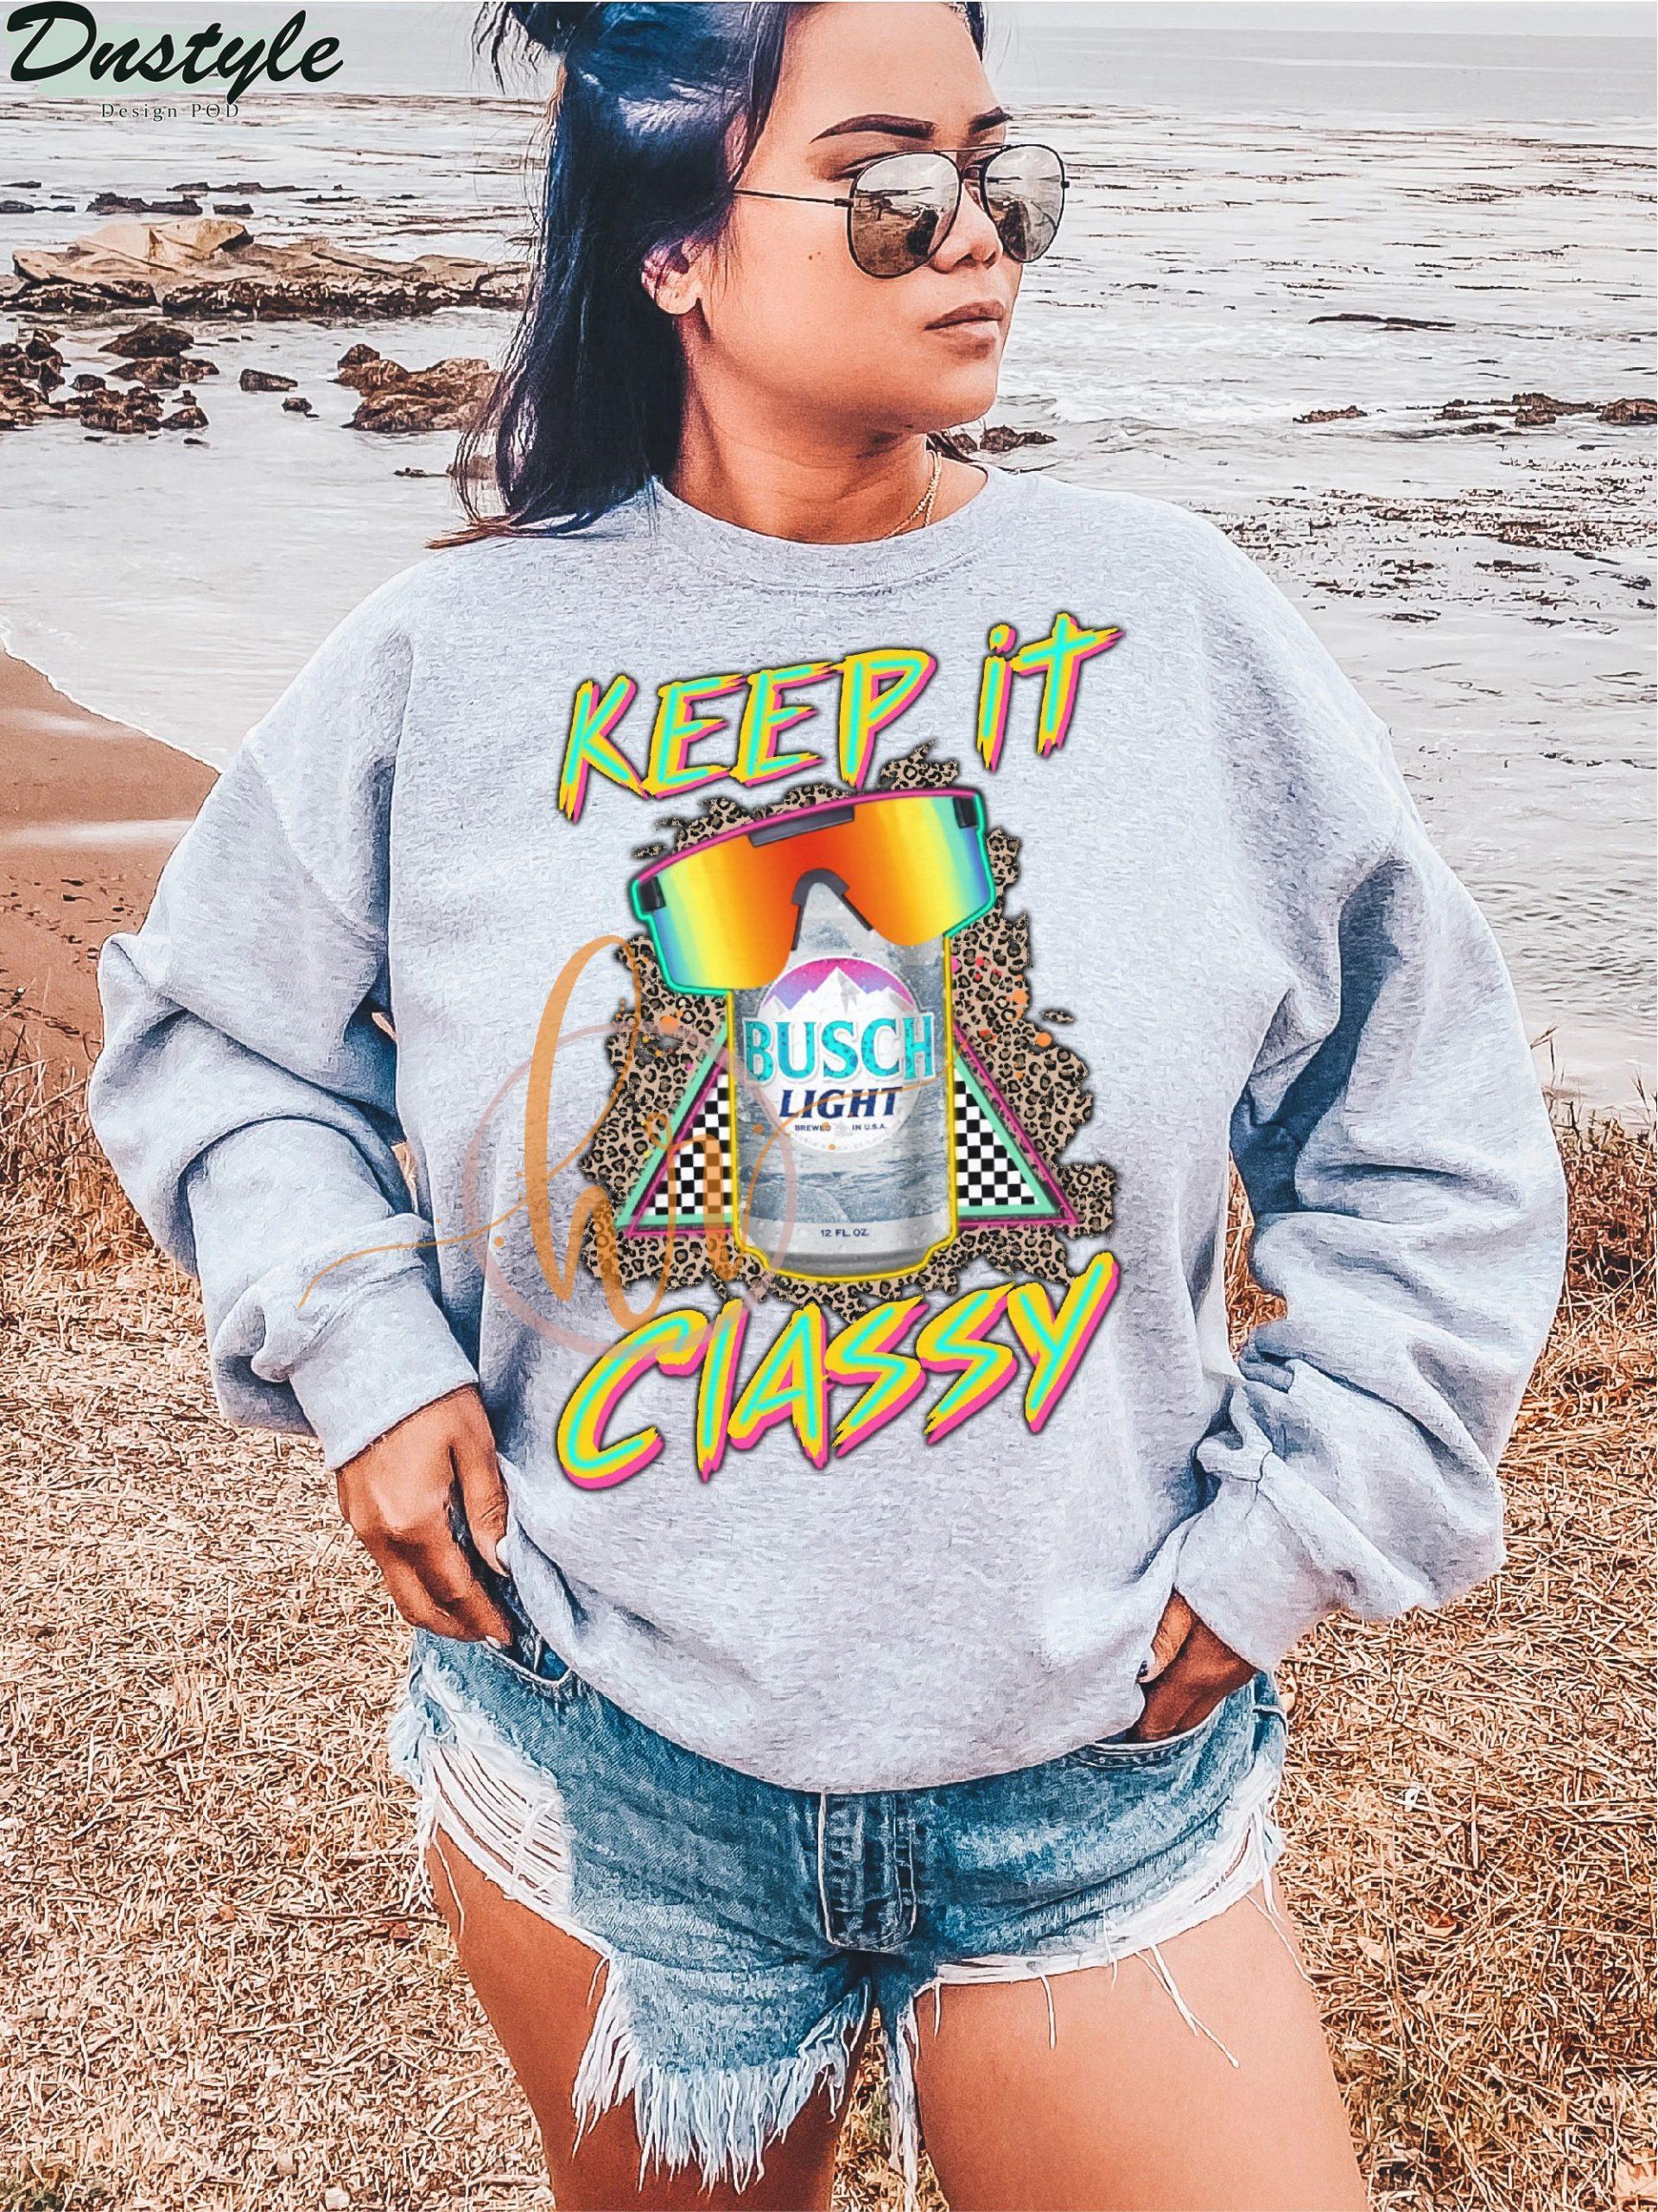 Busch light keep it classy sweatshirt